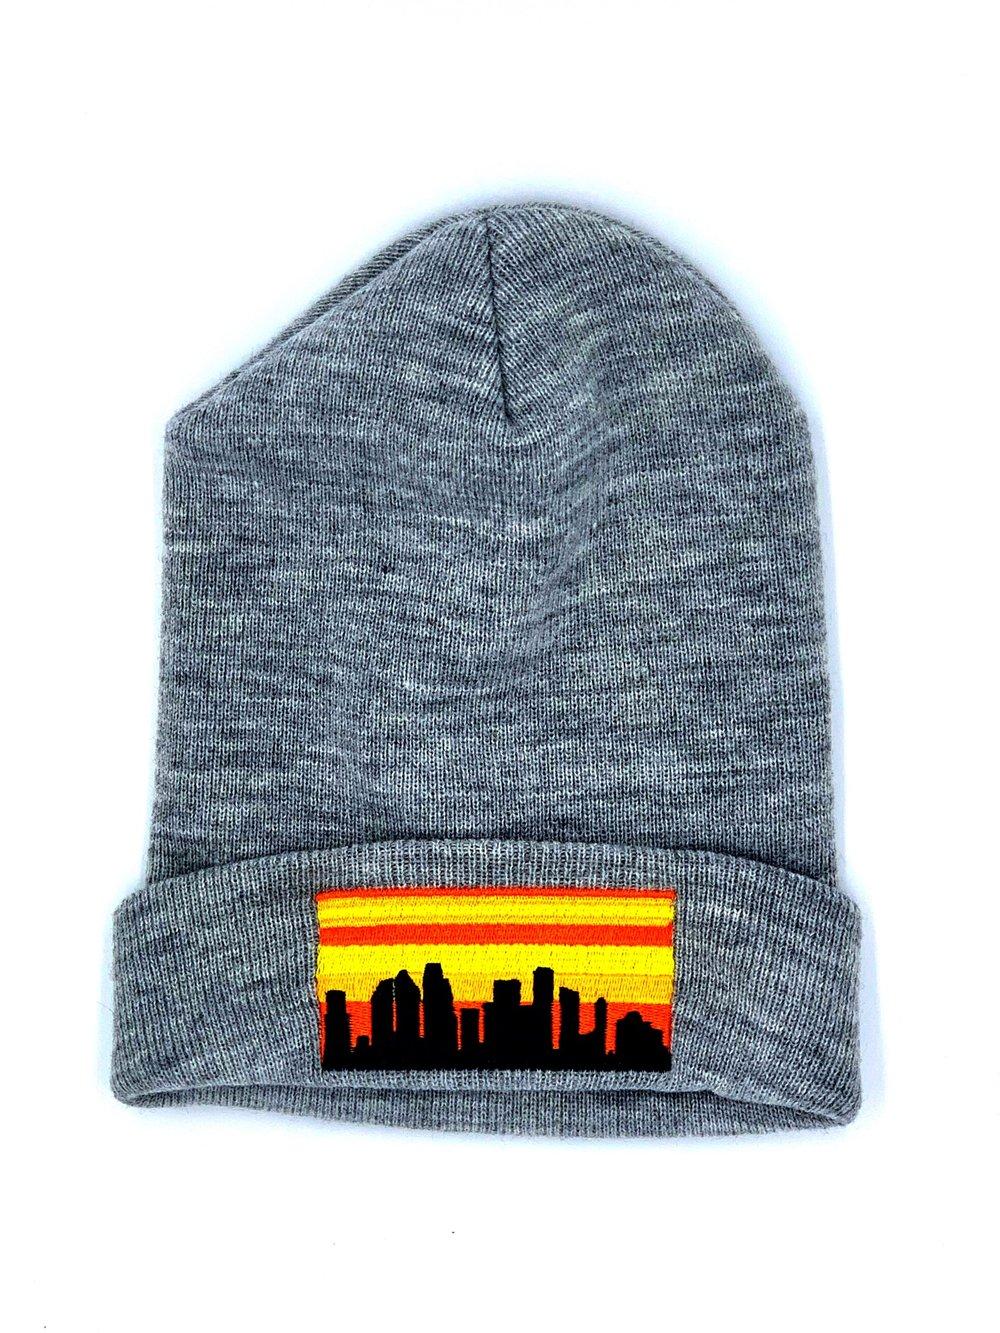 Embroidered Houston Skyline Knit Cap